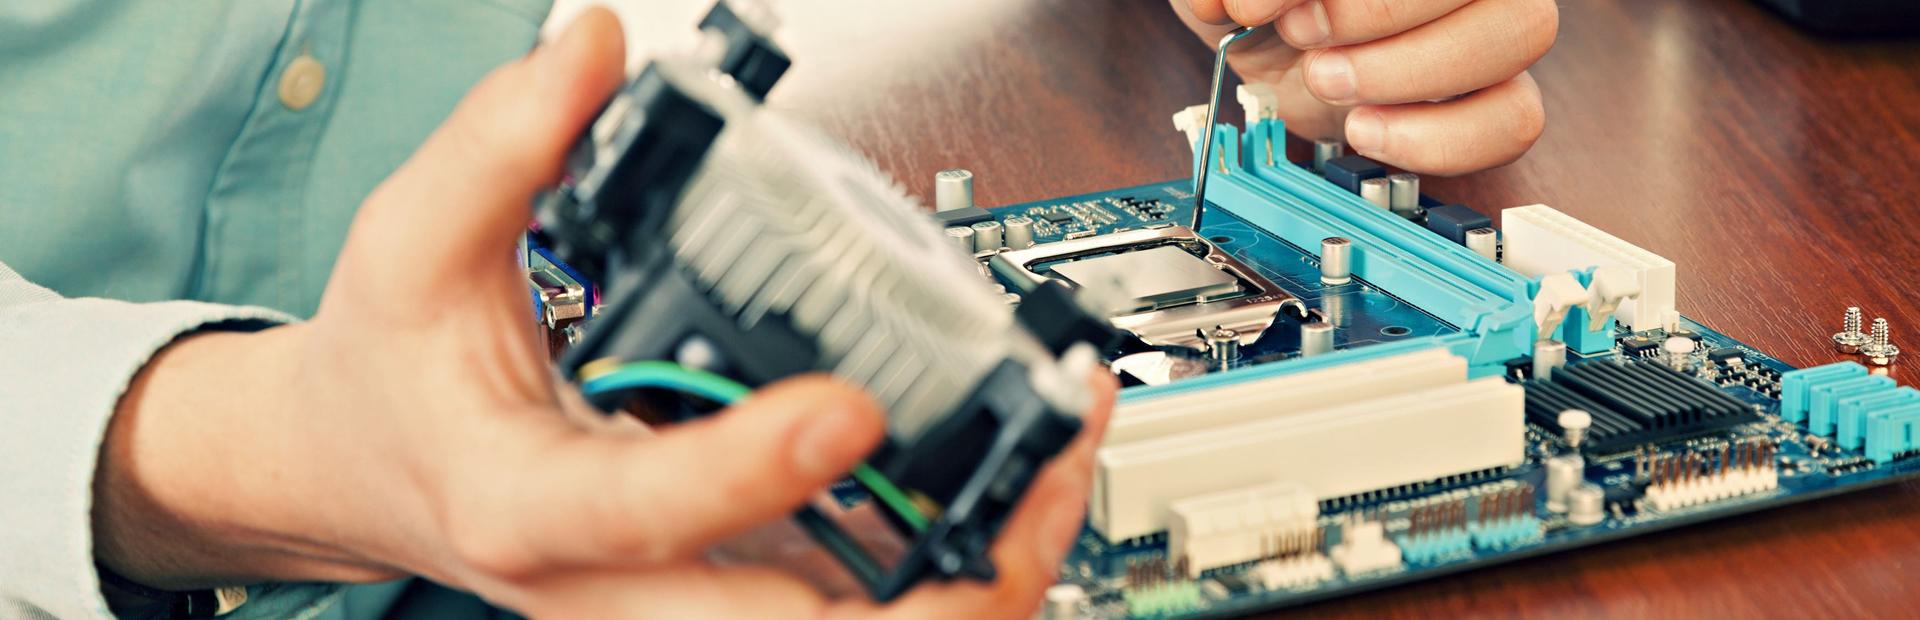 Computer Repair Center